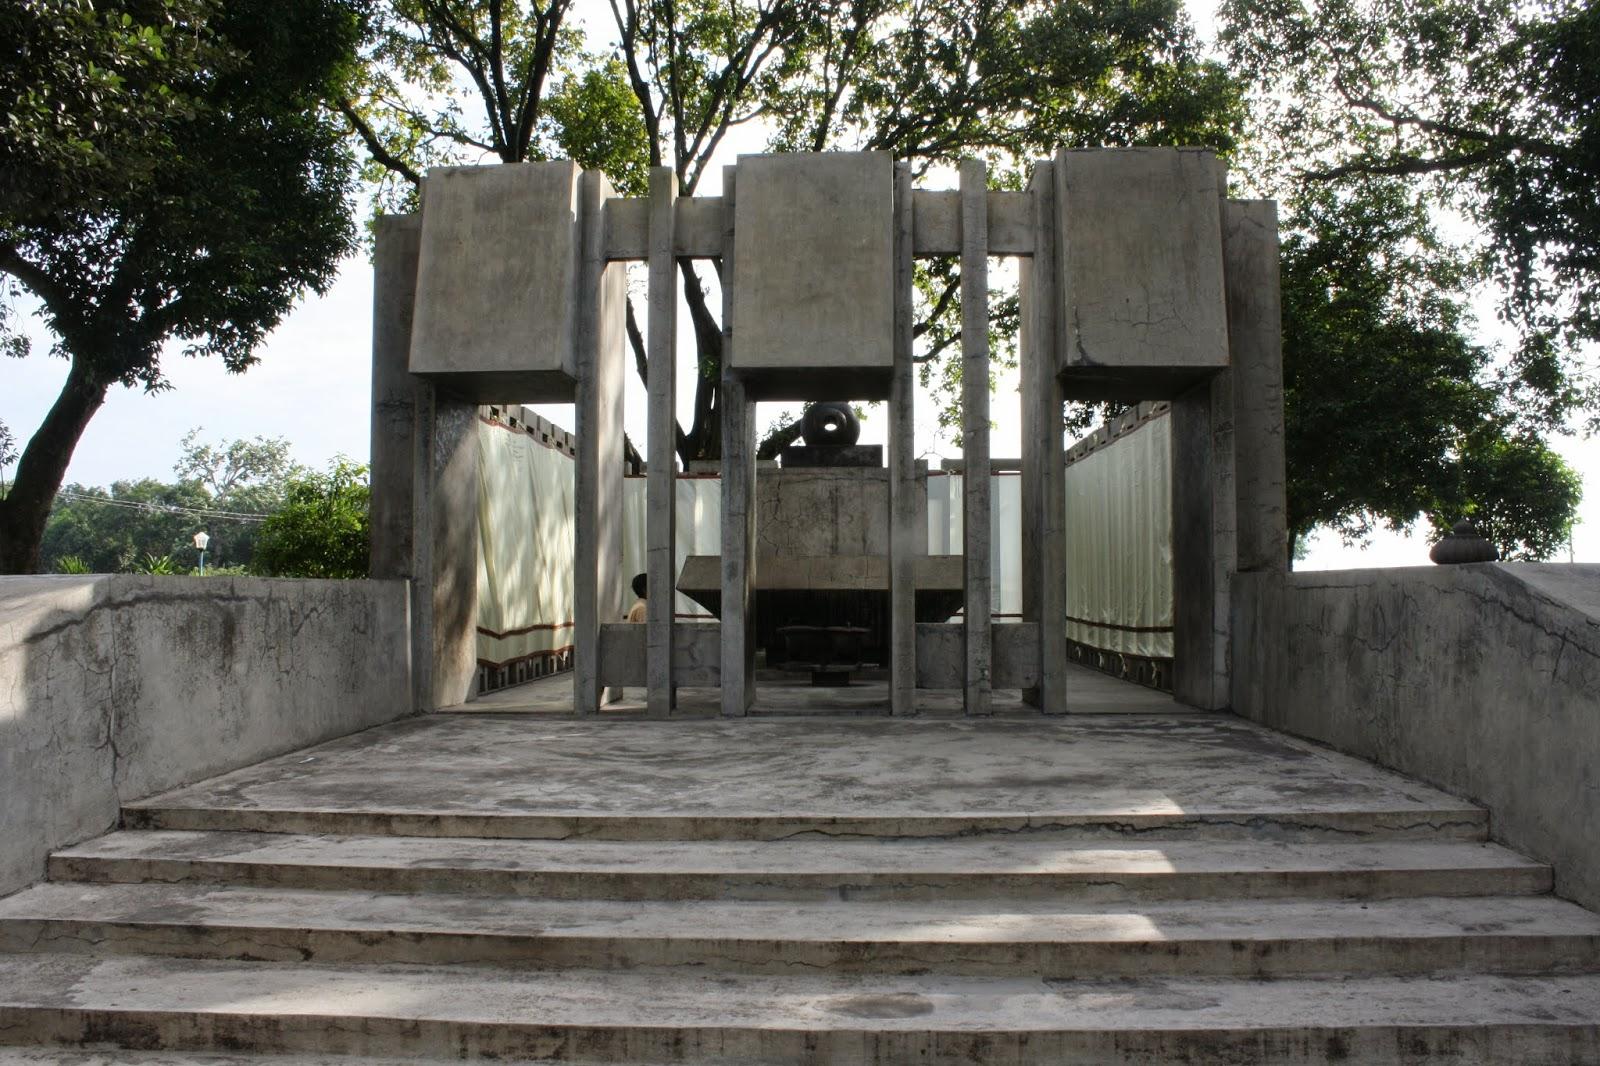 Sri Aji Joyoboyo Pariwisata Kabupaten Kediri Sendang Tirta Kamandanu Kab